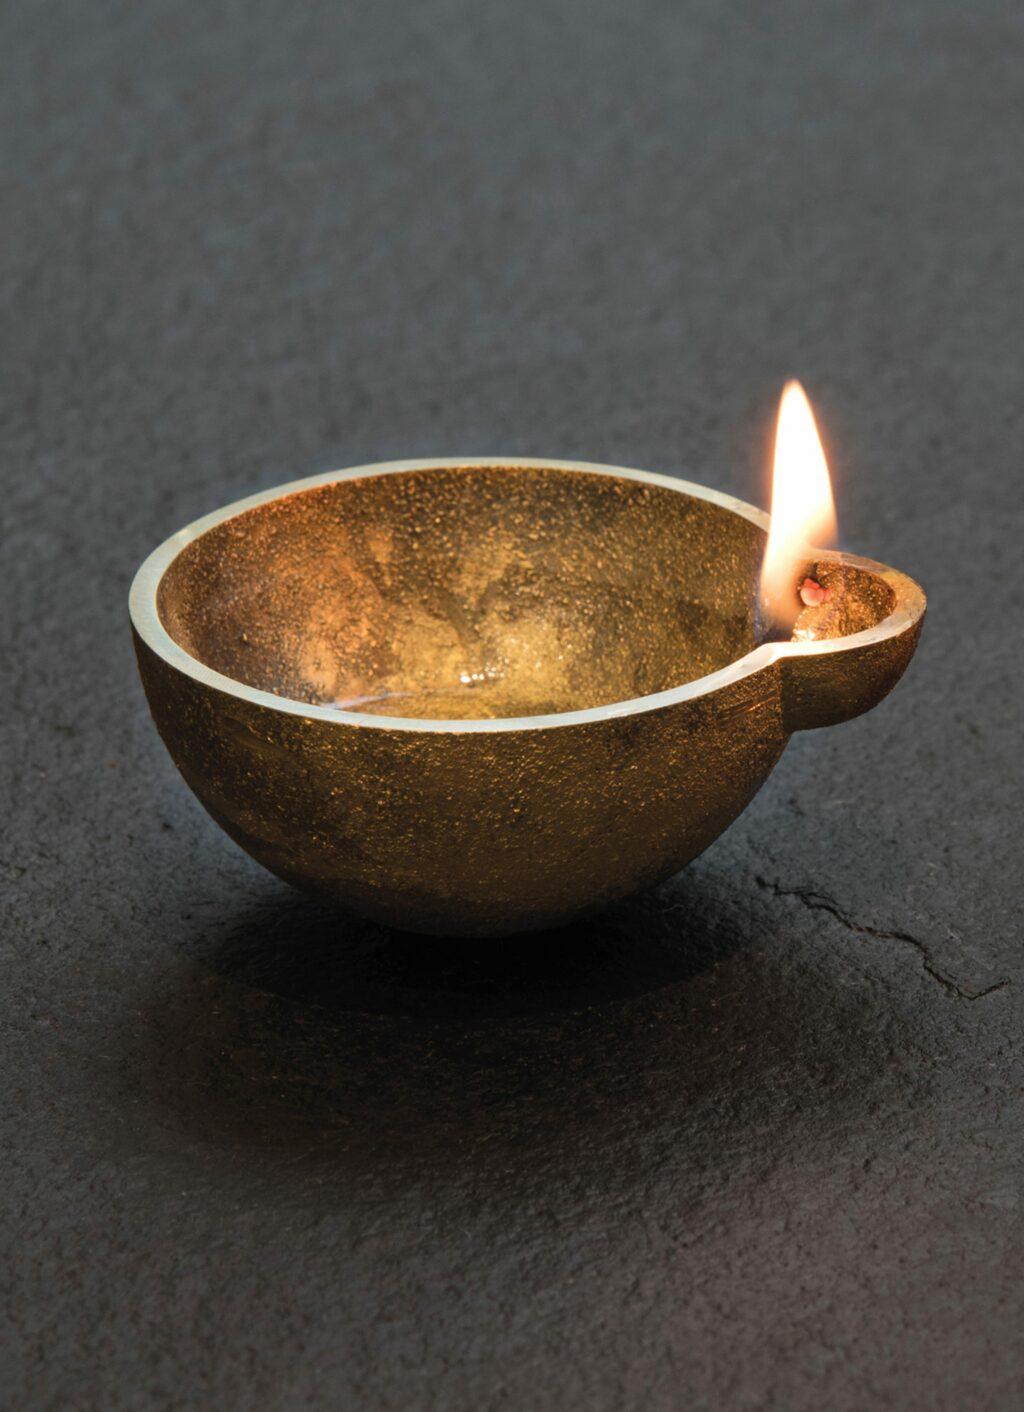 Case goods - Buenos Diyas - Oil lamp - Solid brass